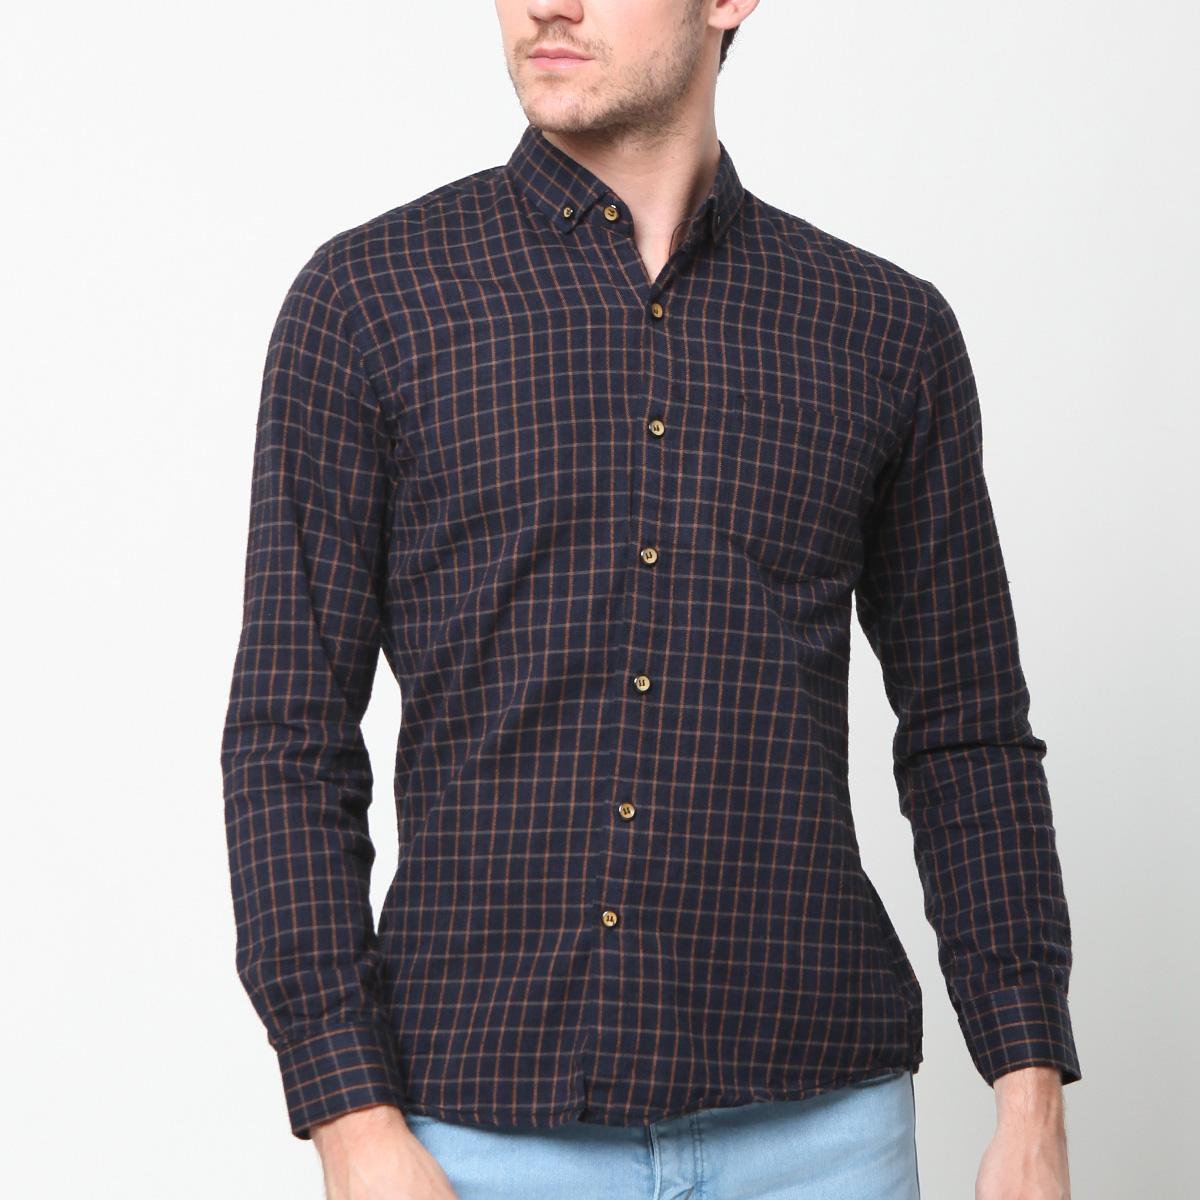 MENTLI Kemeja Flanel Cowo - Arthur Flannel Shirt